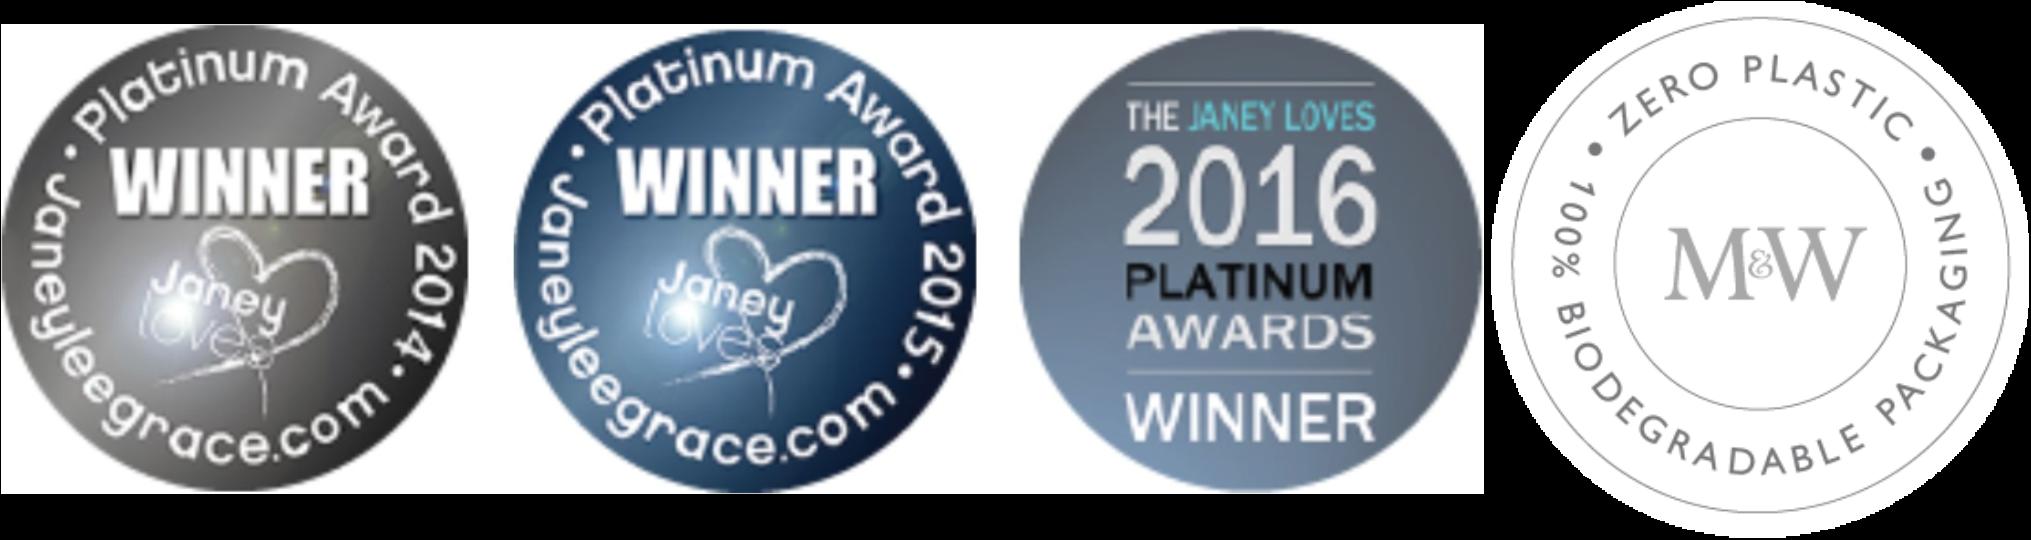 Mangle & Wringer awards